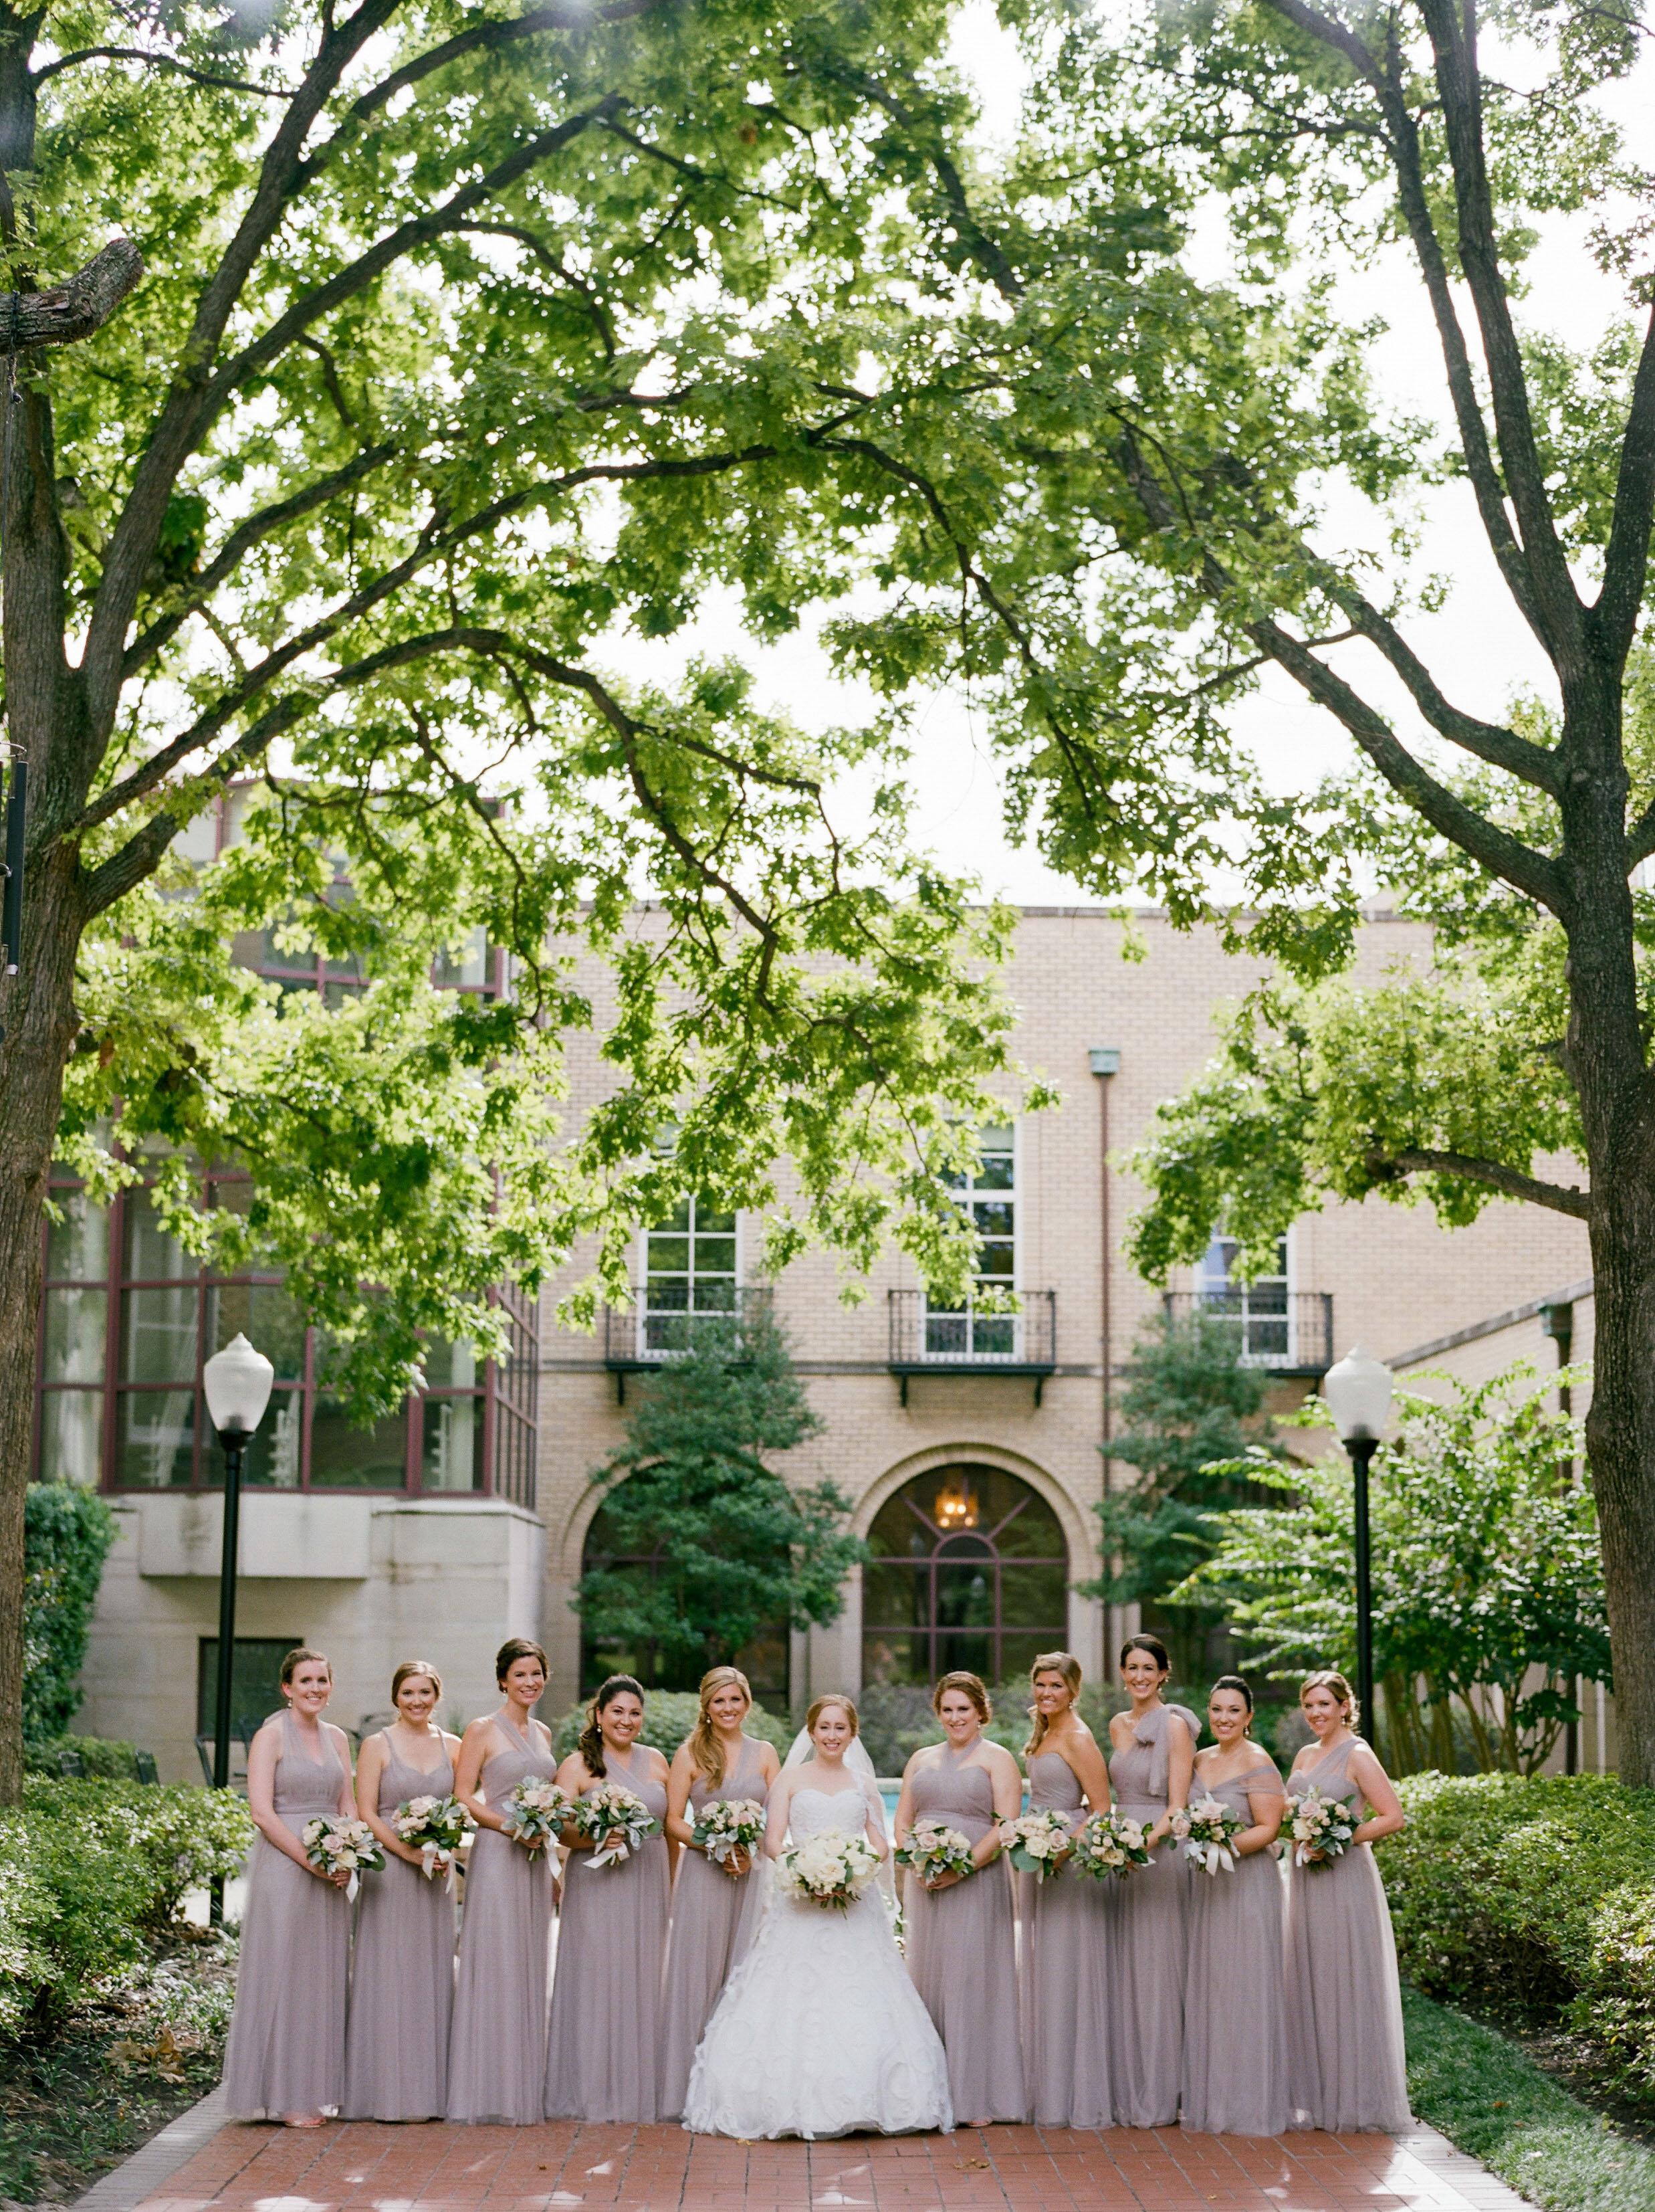 Fine-Art-Film-Houston-Wedding-Photographer-Best-Top-Luxury-Texas-Austin-Dallas-Destination-Dana-Fernandez-Photography-River-Oaks-Country-Club-South-Main-Baptist-Ceremony-Reception-Wedding-27.jpg